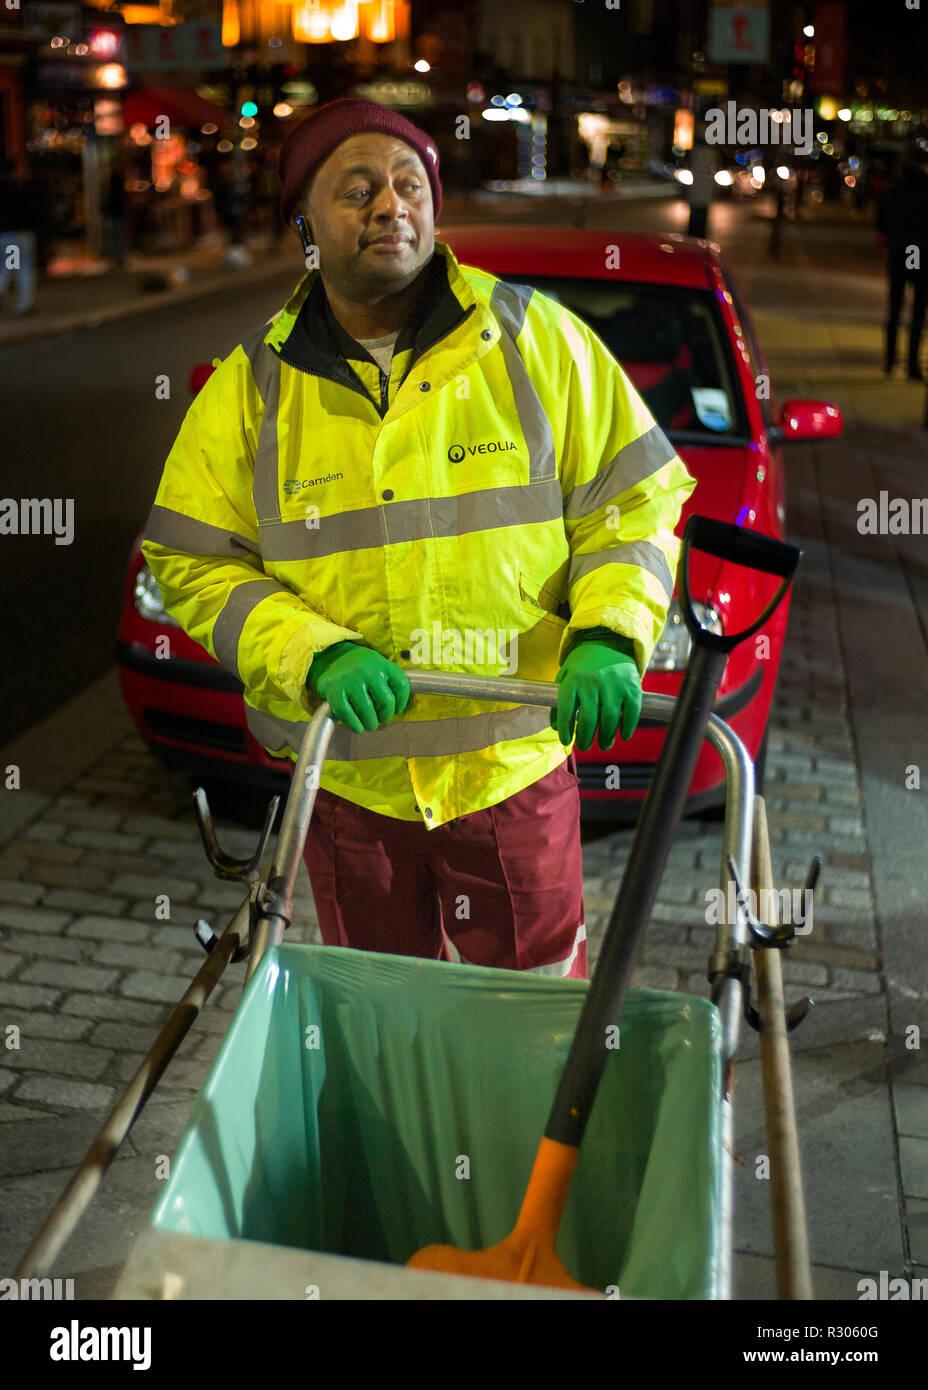 street cleaner at night, Camden High street London, Stock Photo